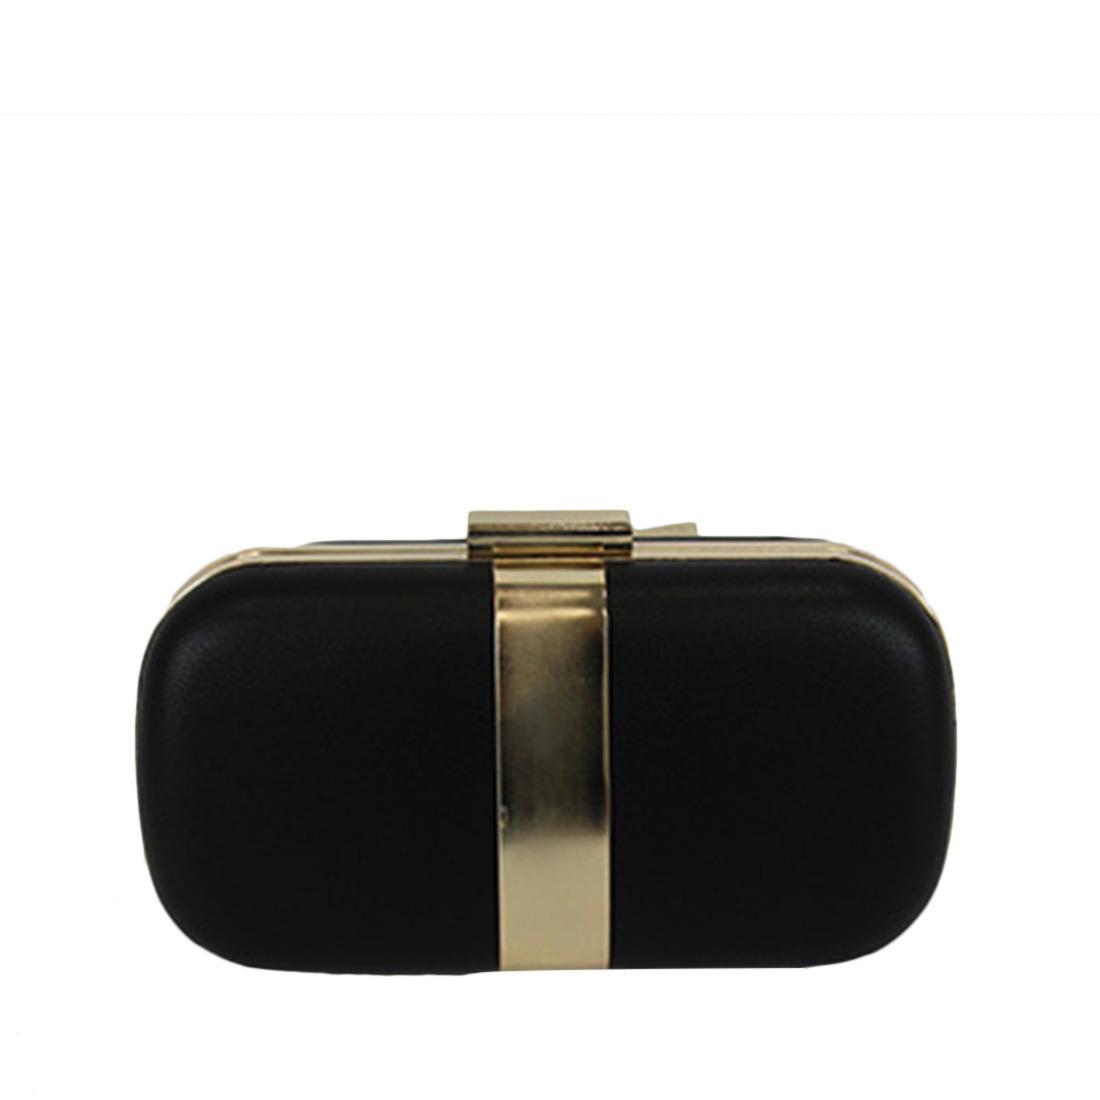 Hard case clutch bag with gold trim